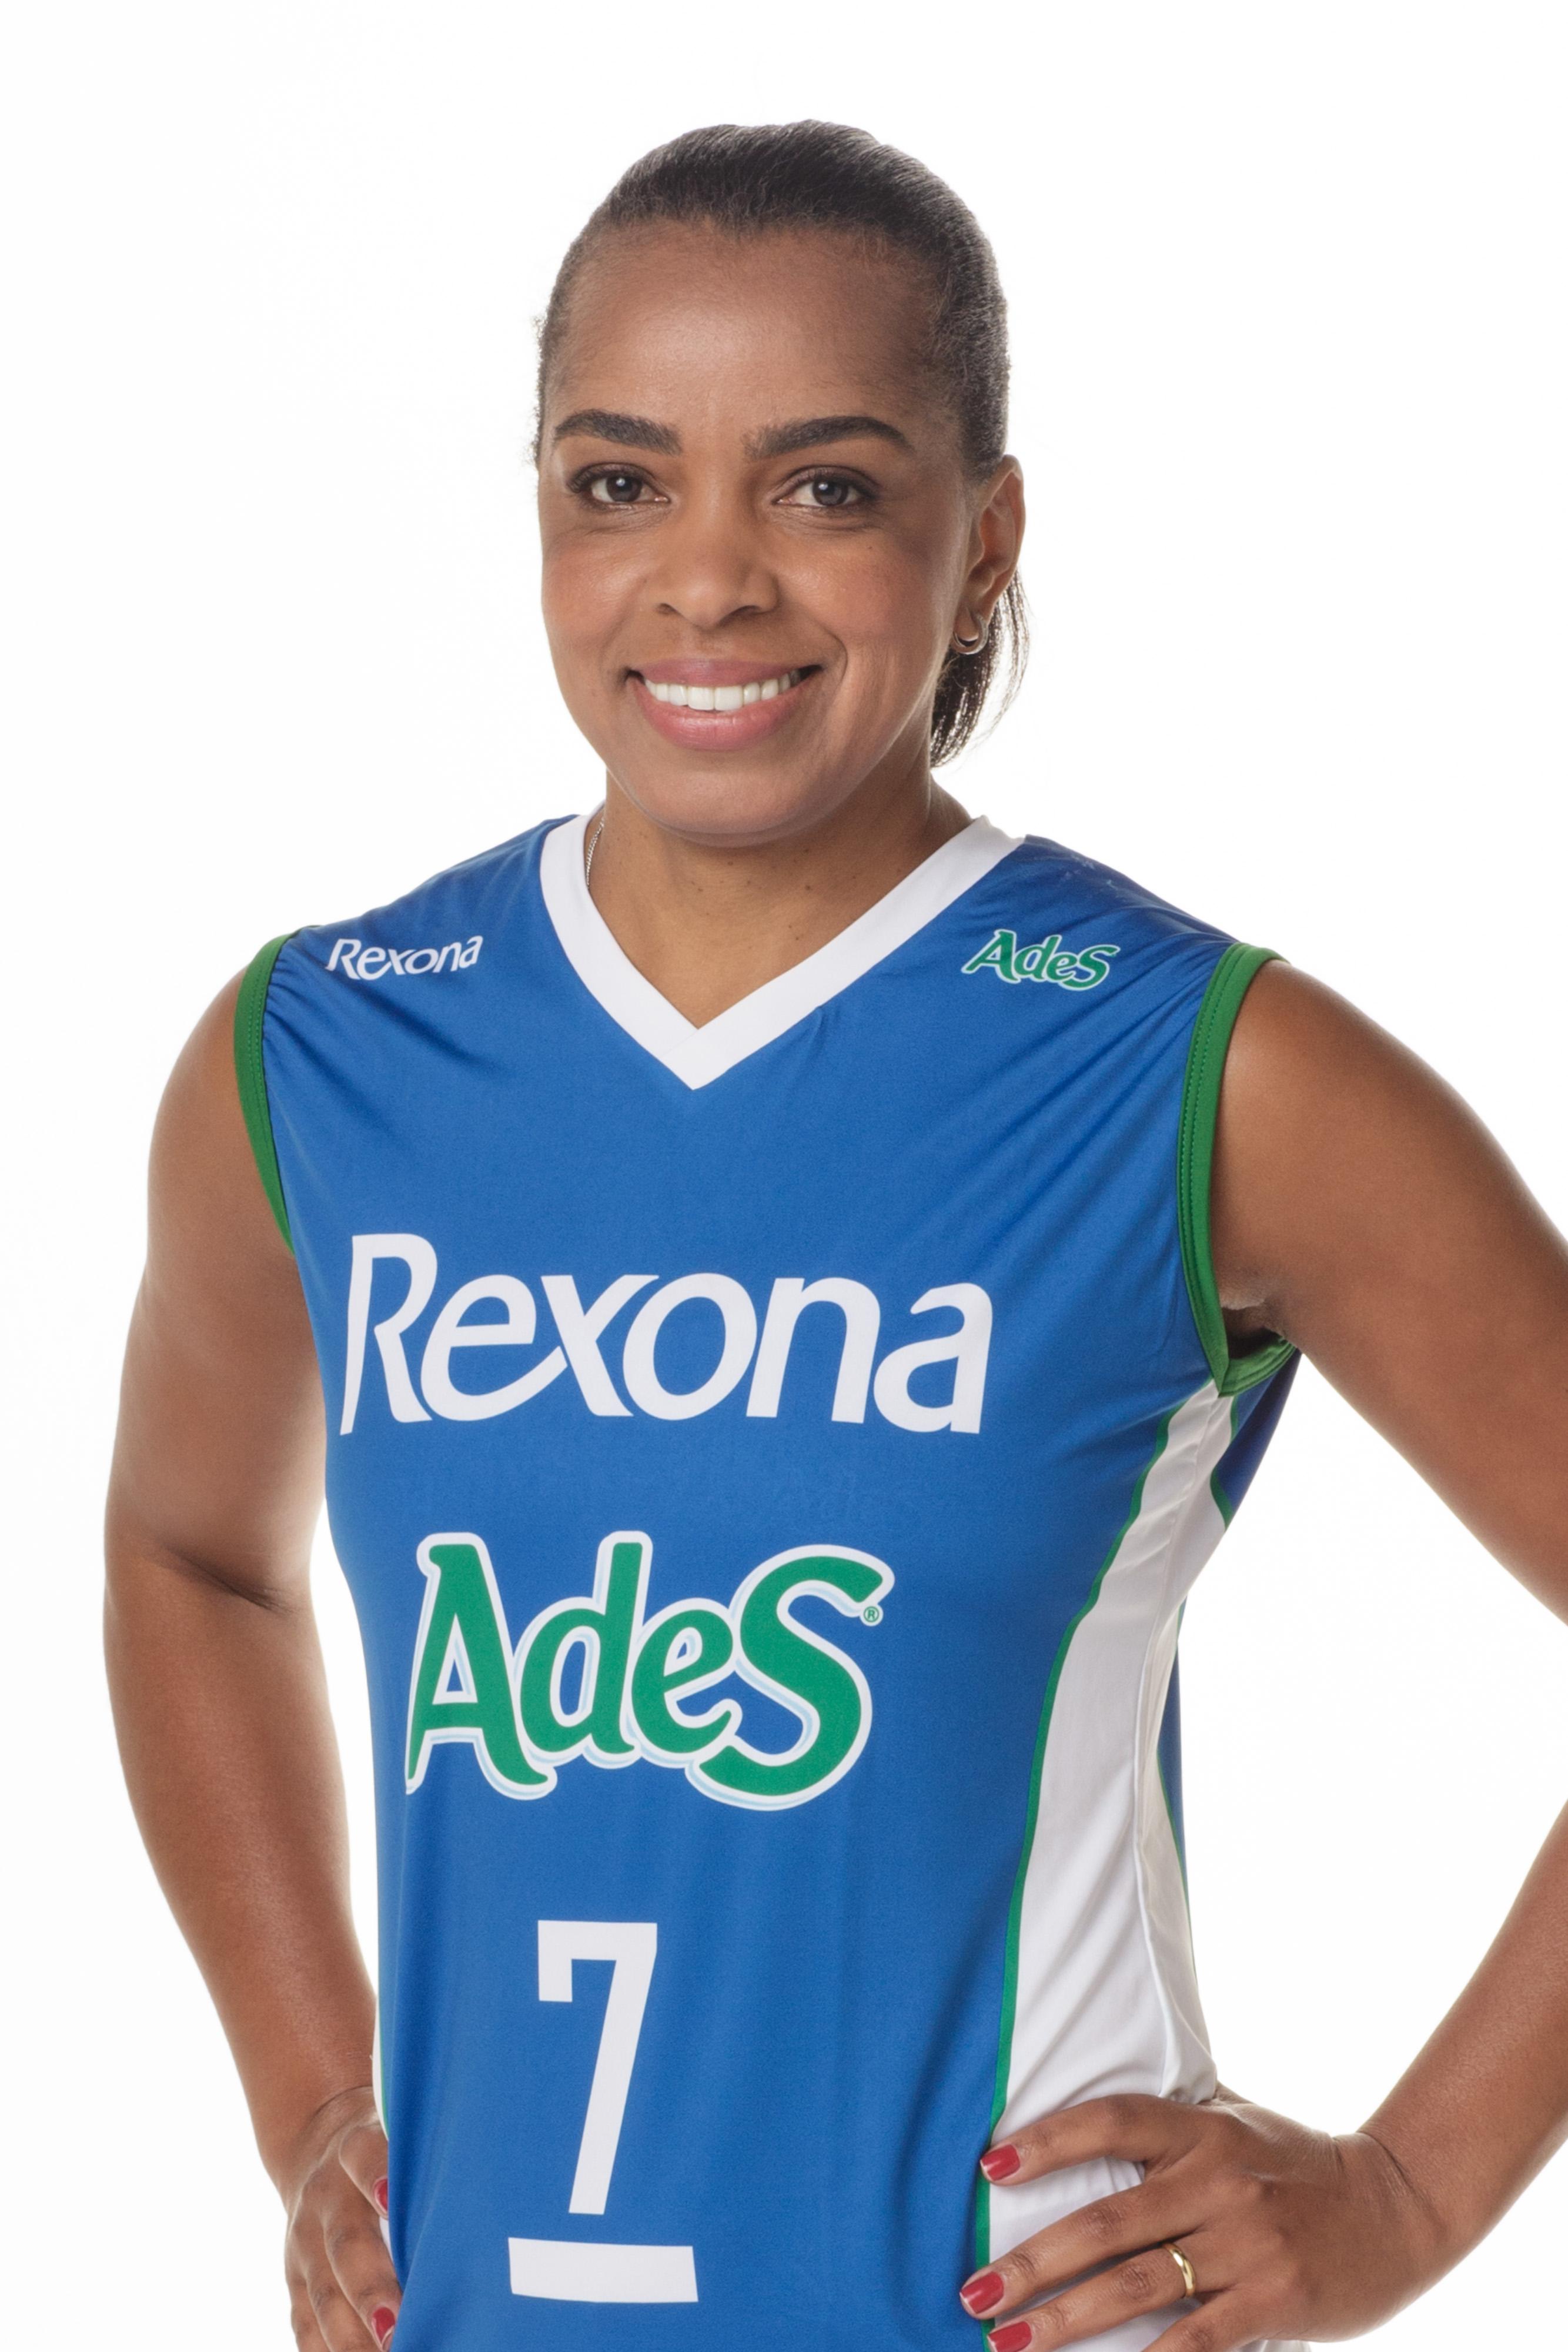 Helia Rogerio De Souza Pinto